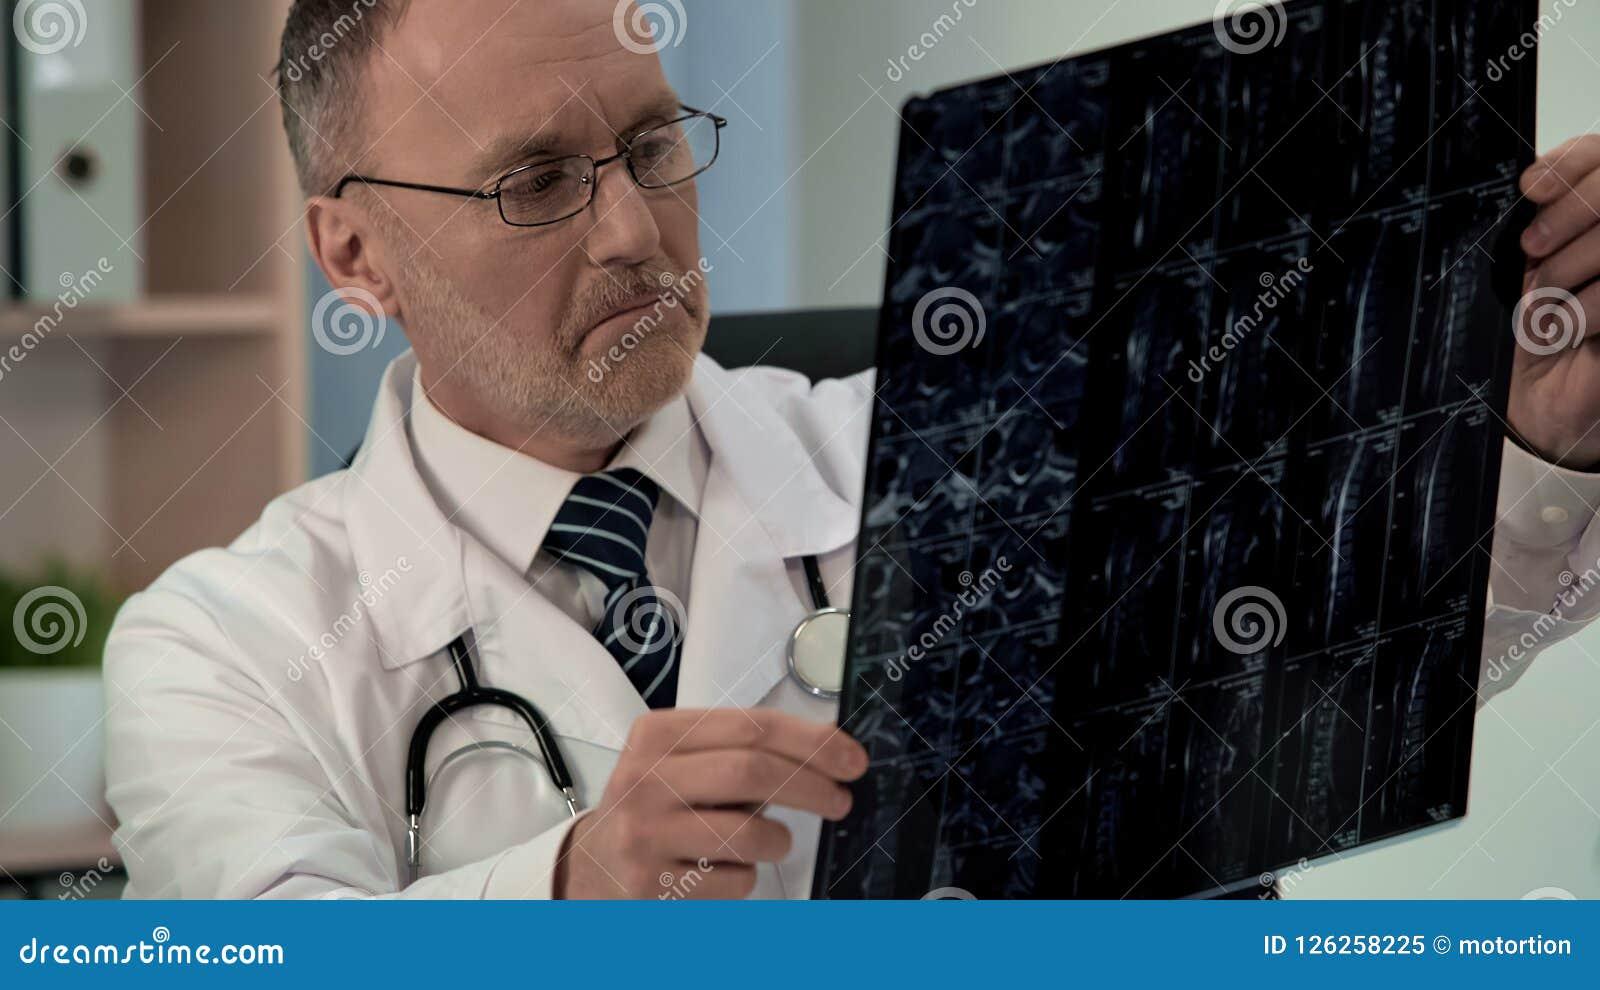 Doctor studying ill patients mri, finds damage in cervical vertebra, diagnostics